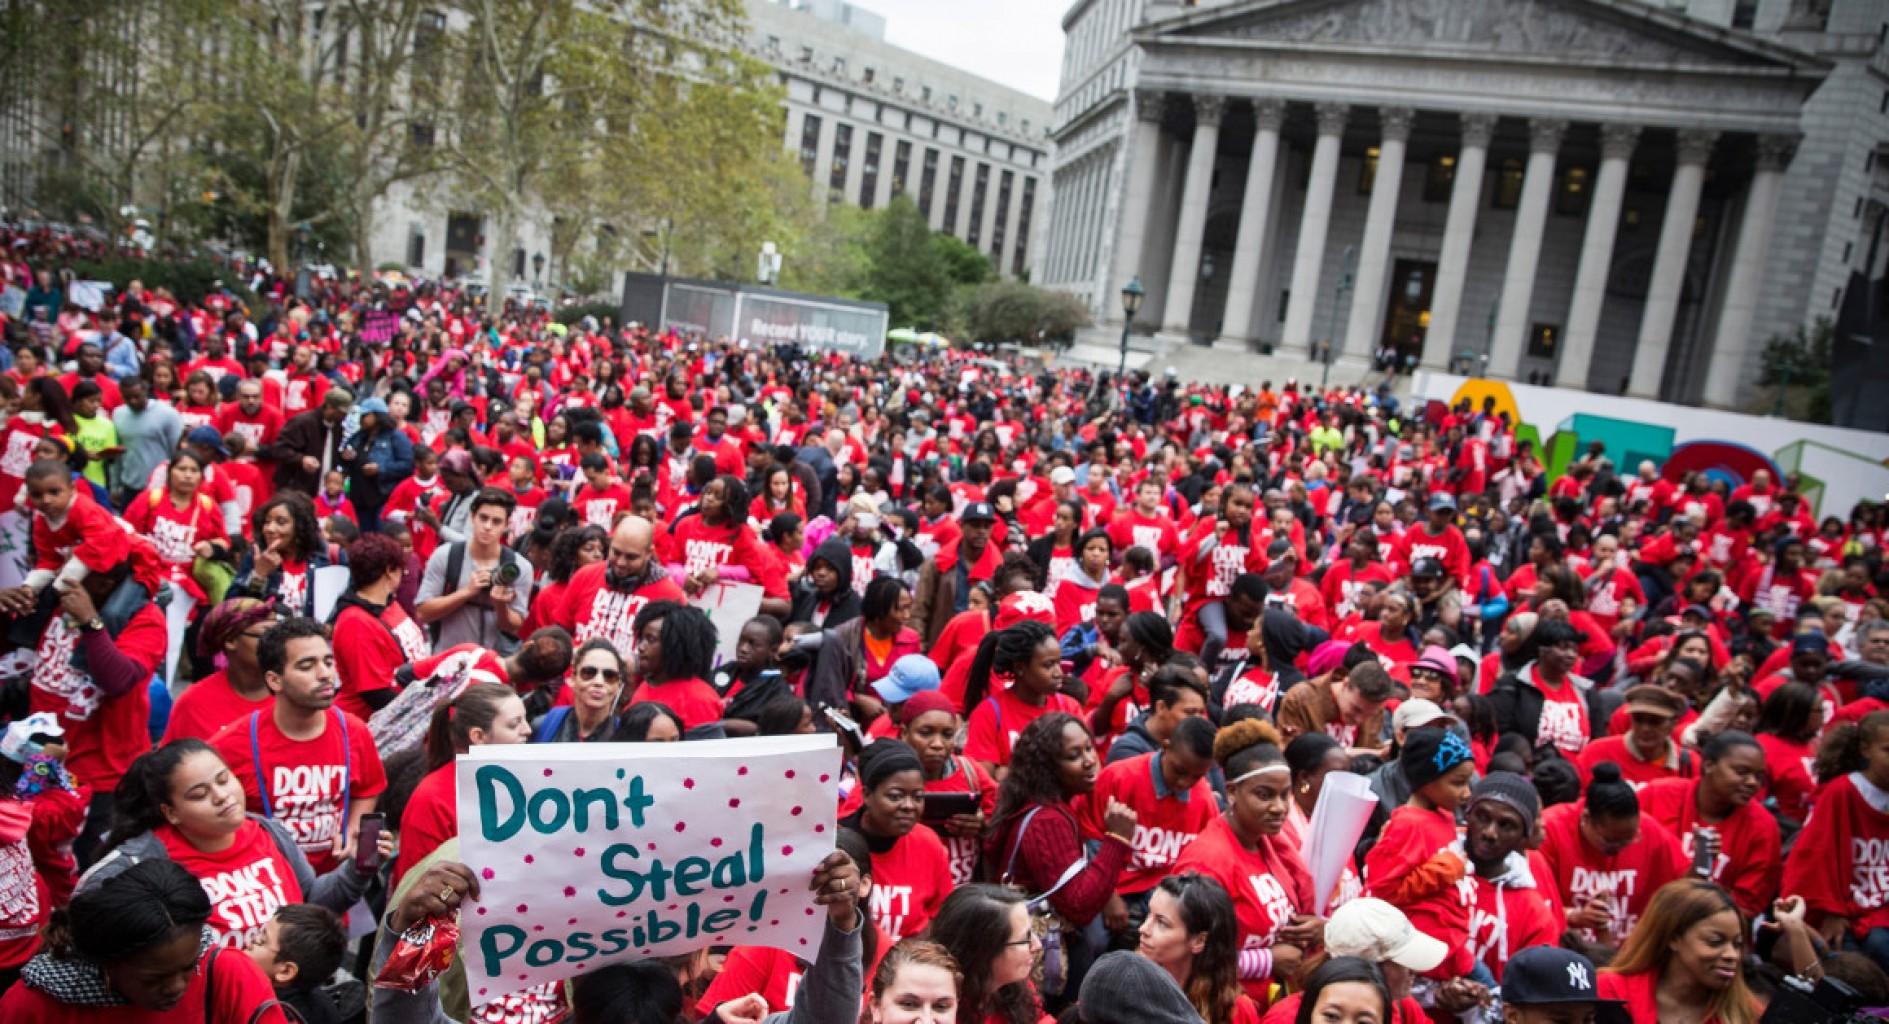 D.C. charter school movement rally